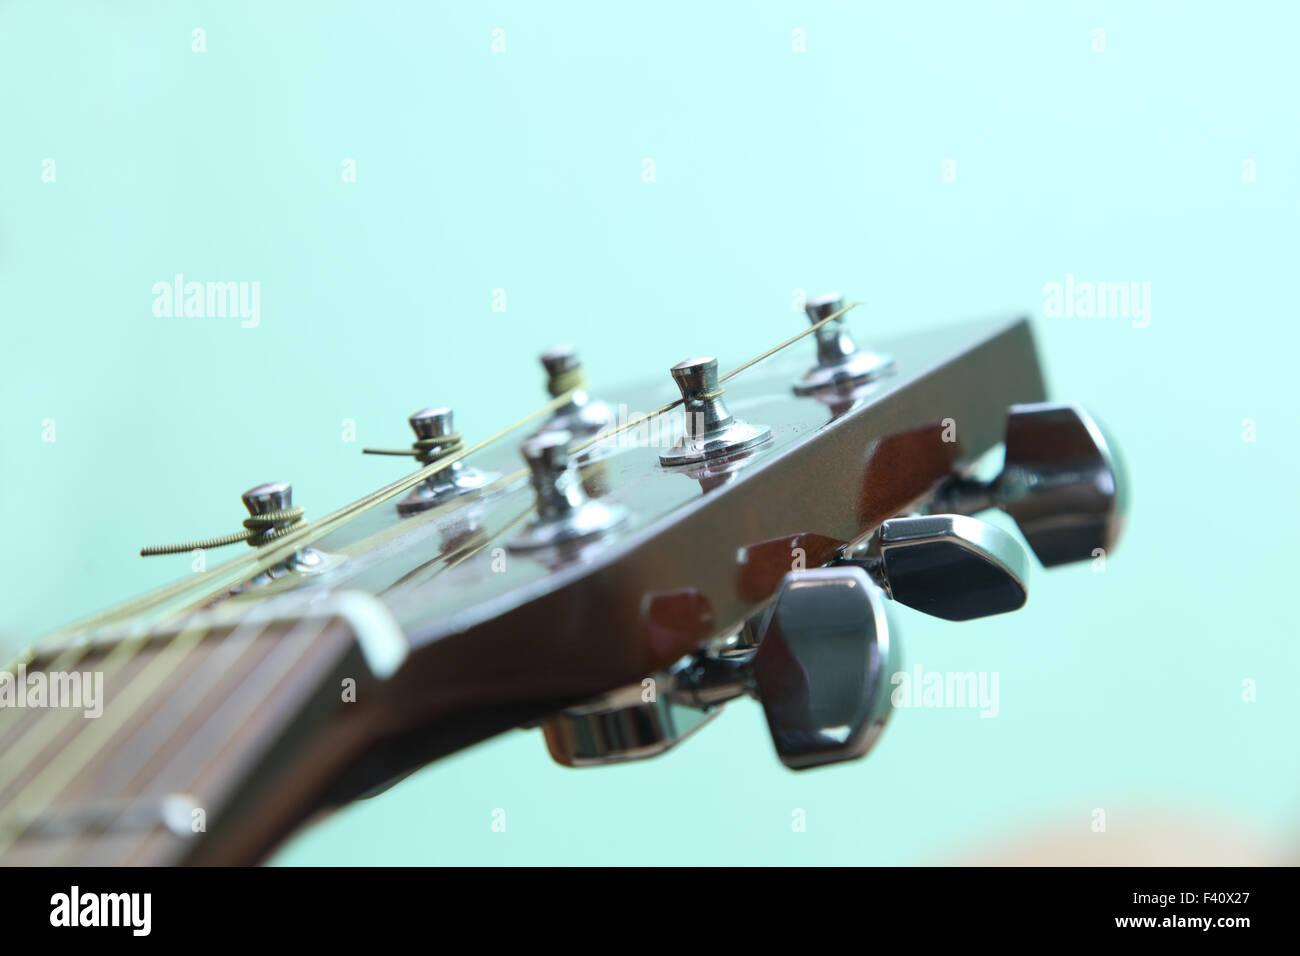 Metal Strings Stock Photos & Metal Strings Stock Images - Alamy